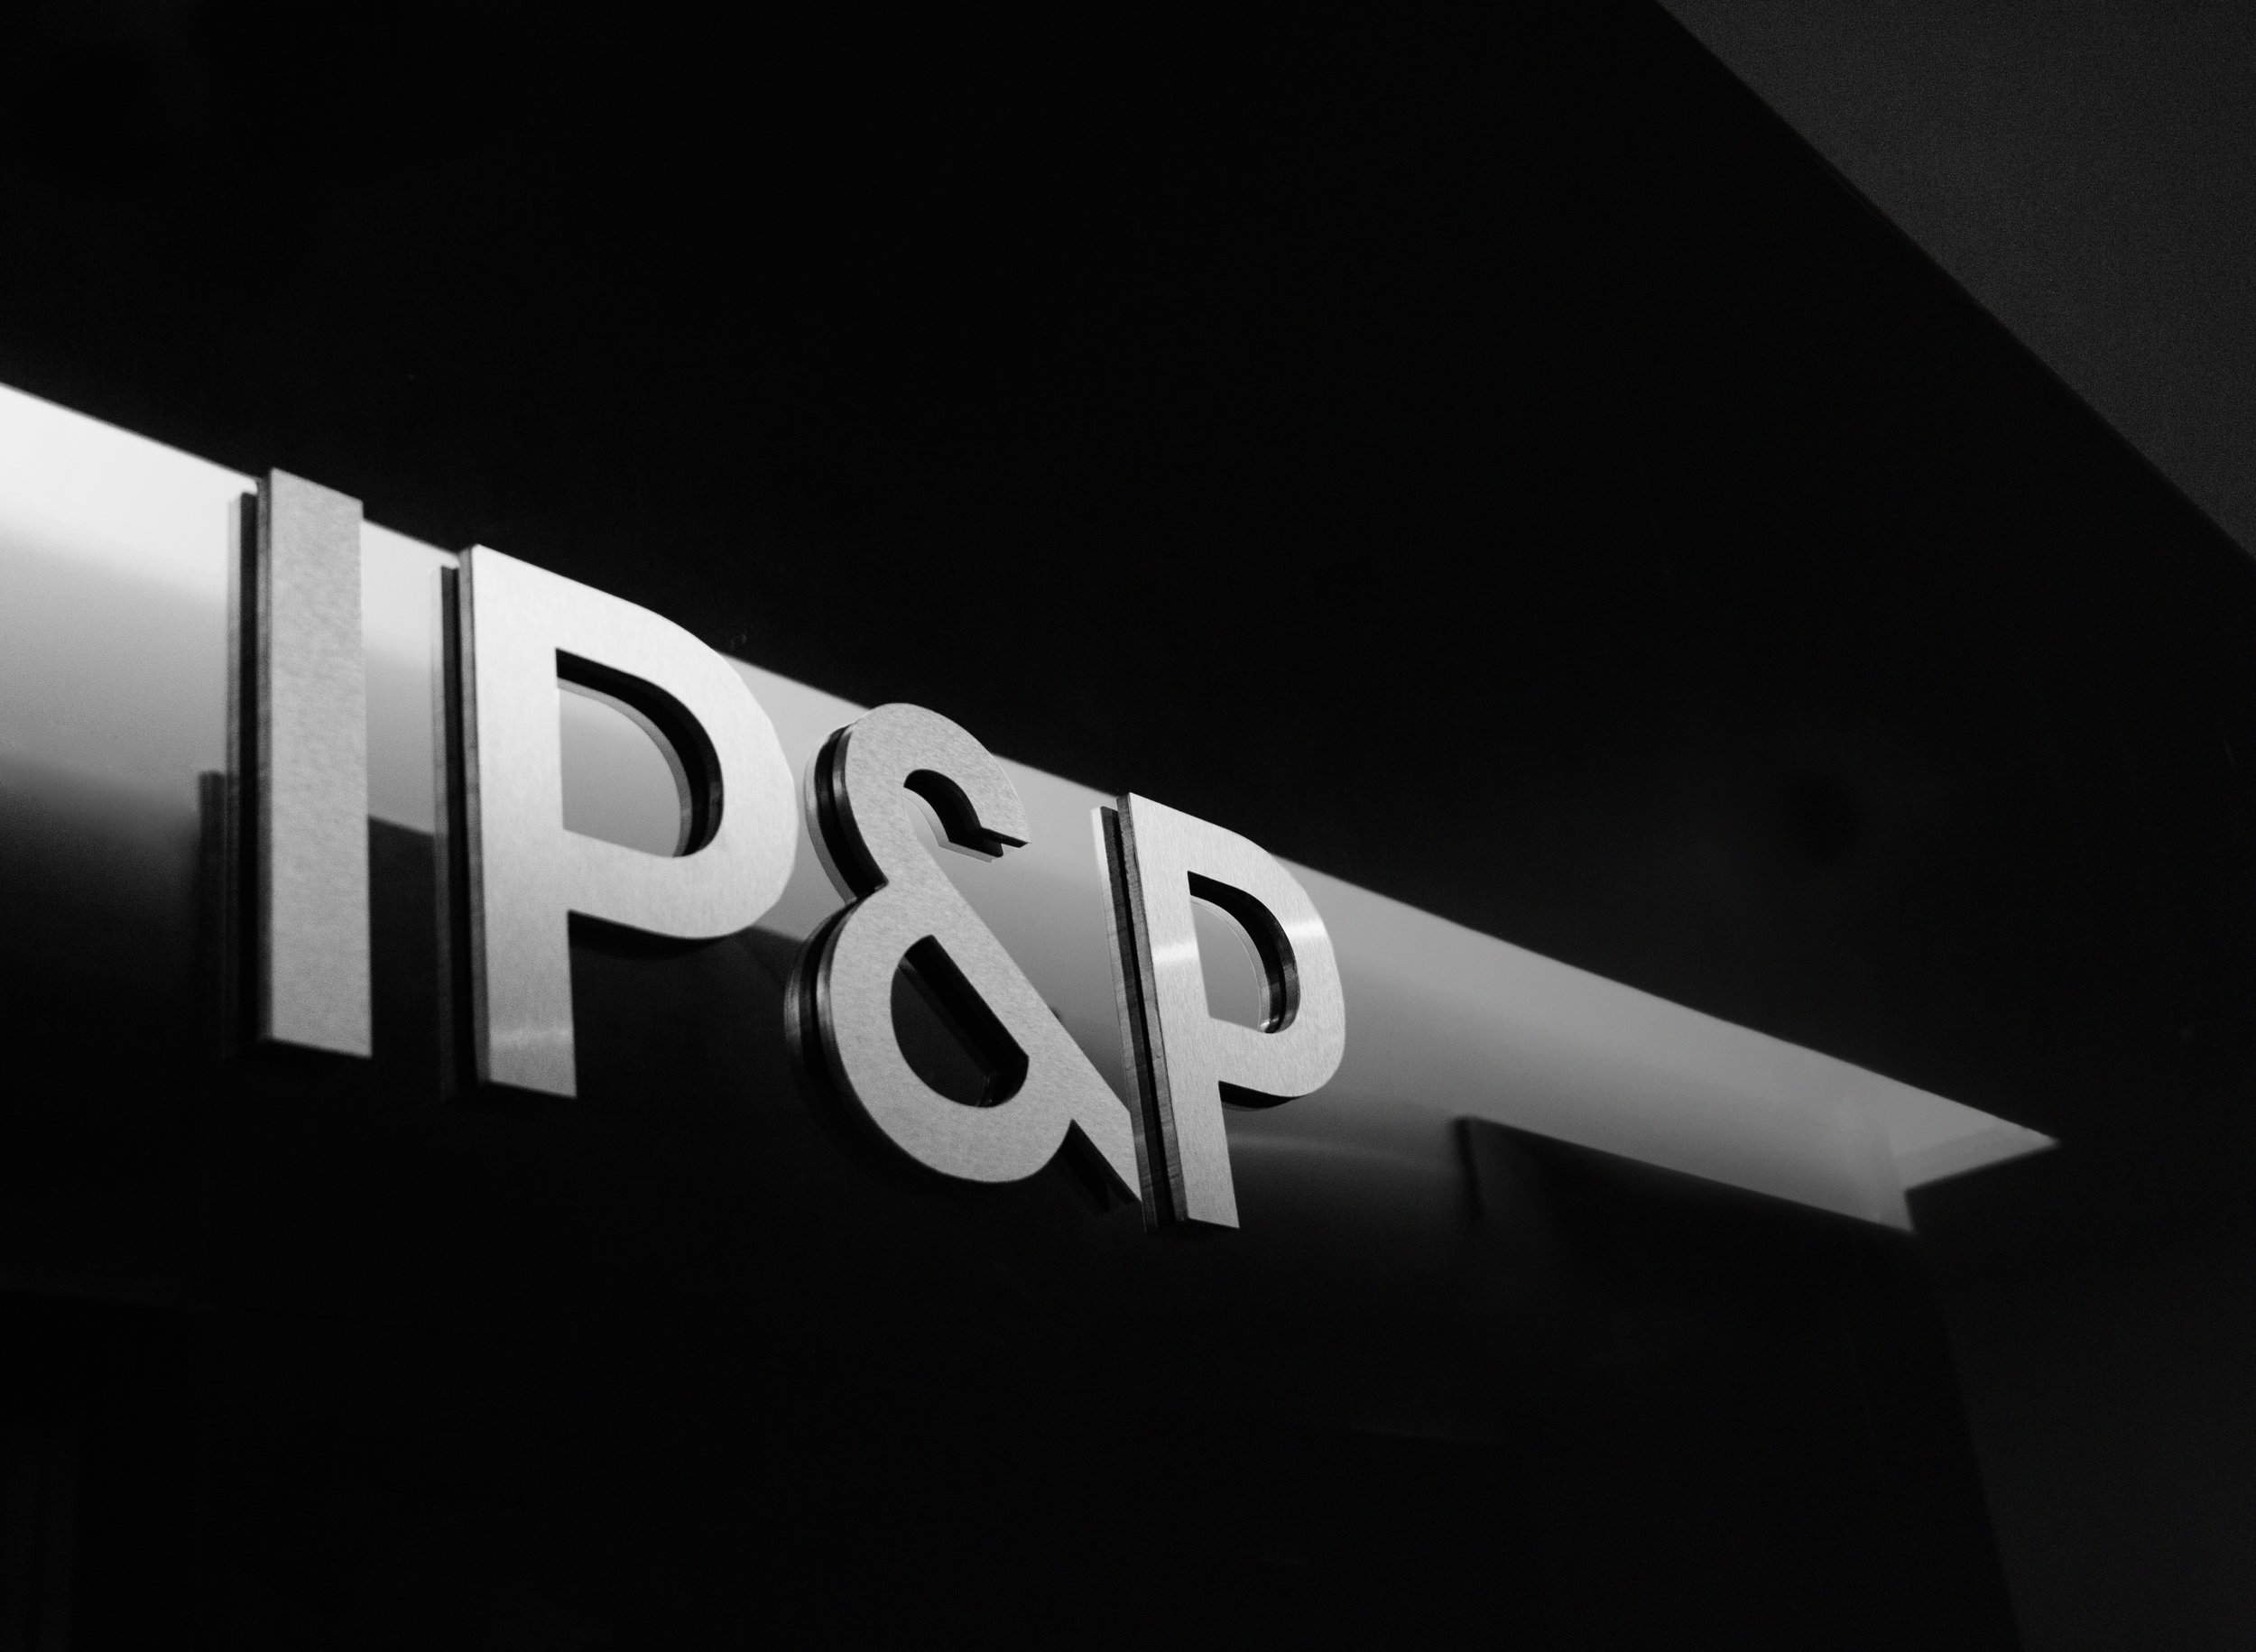 IPP-PORTAFOLIO (1 of 1).jpg